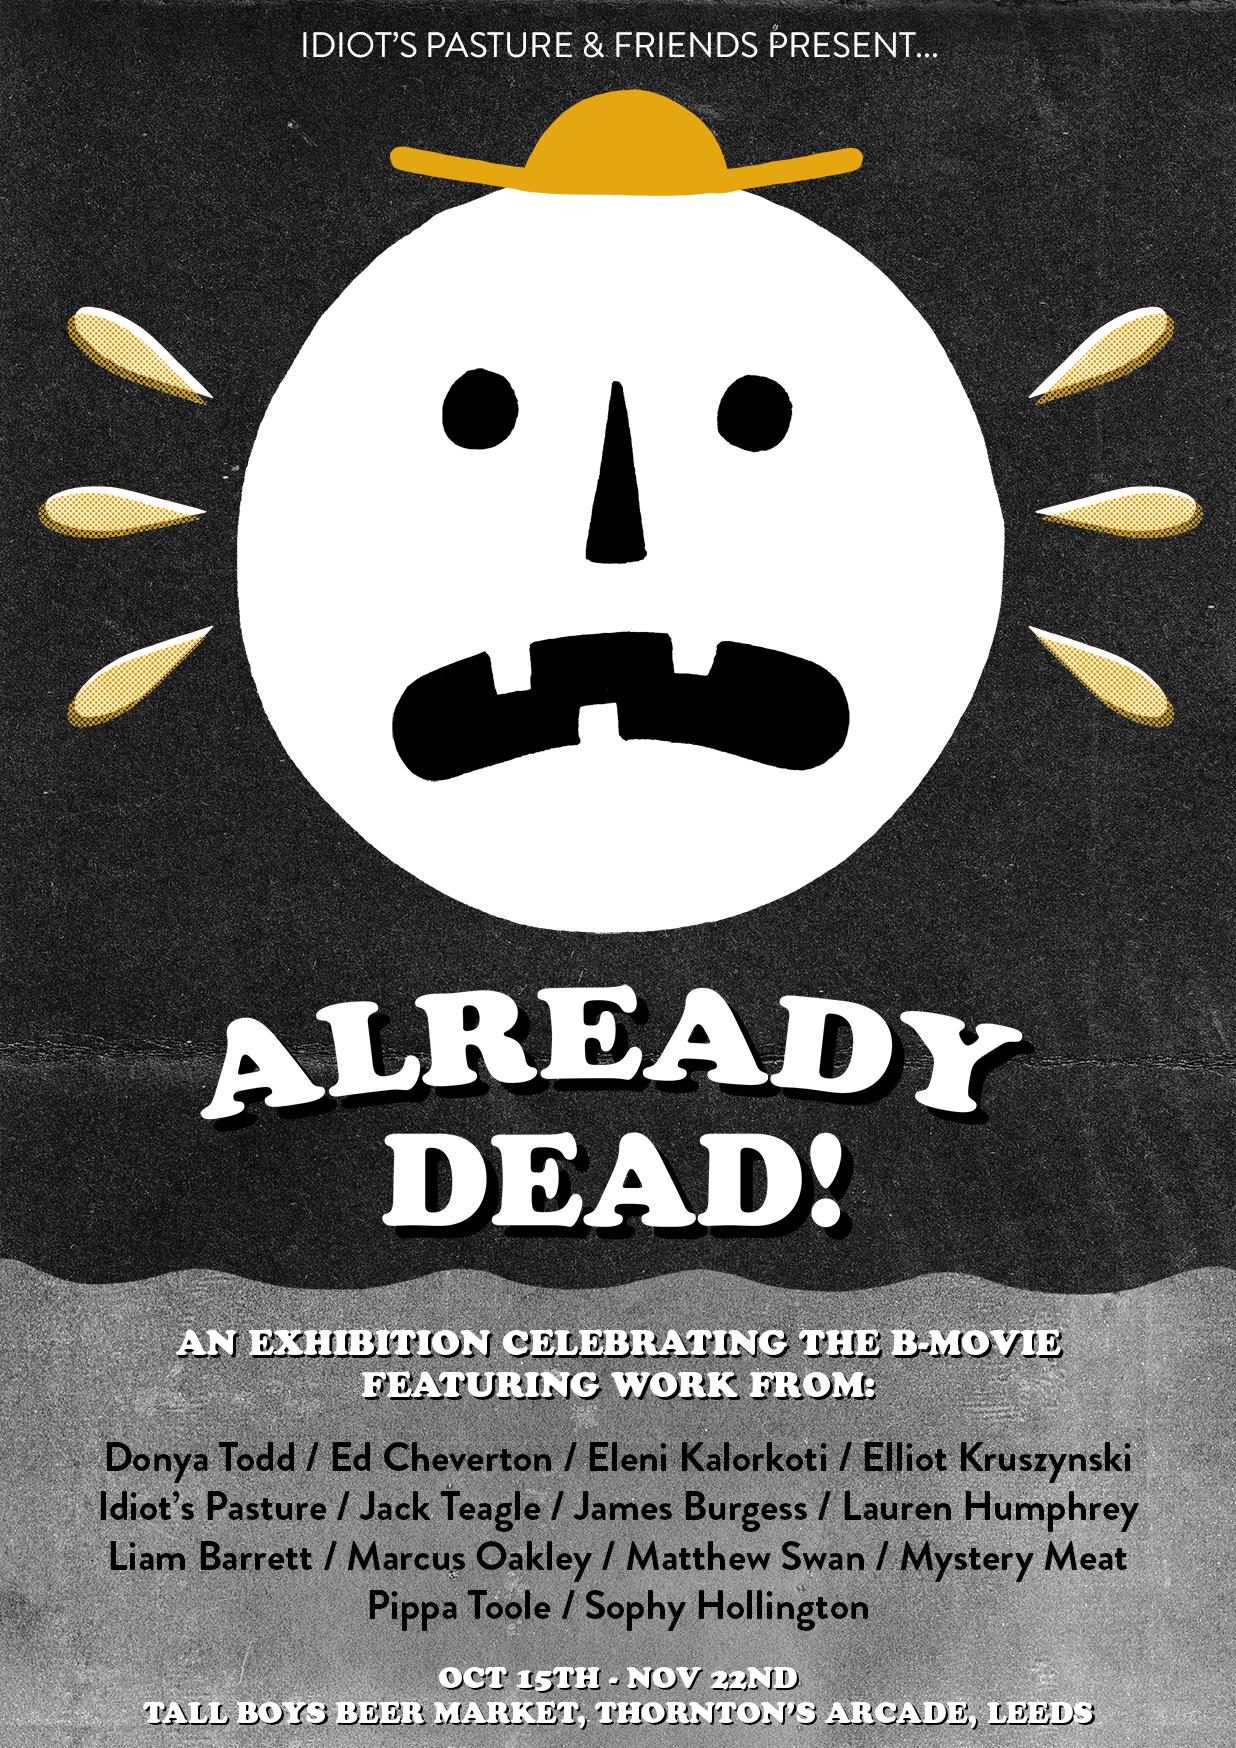 Already Dead exhibition